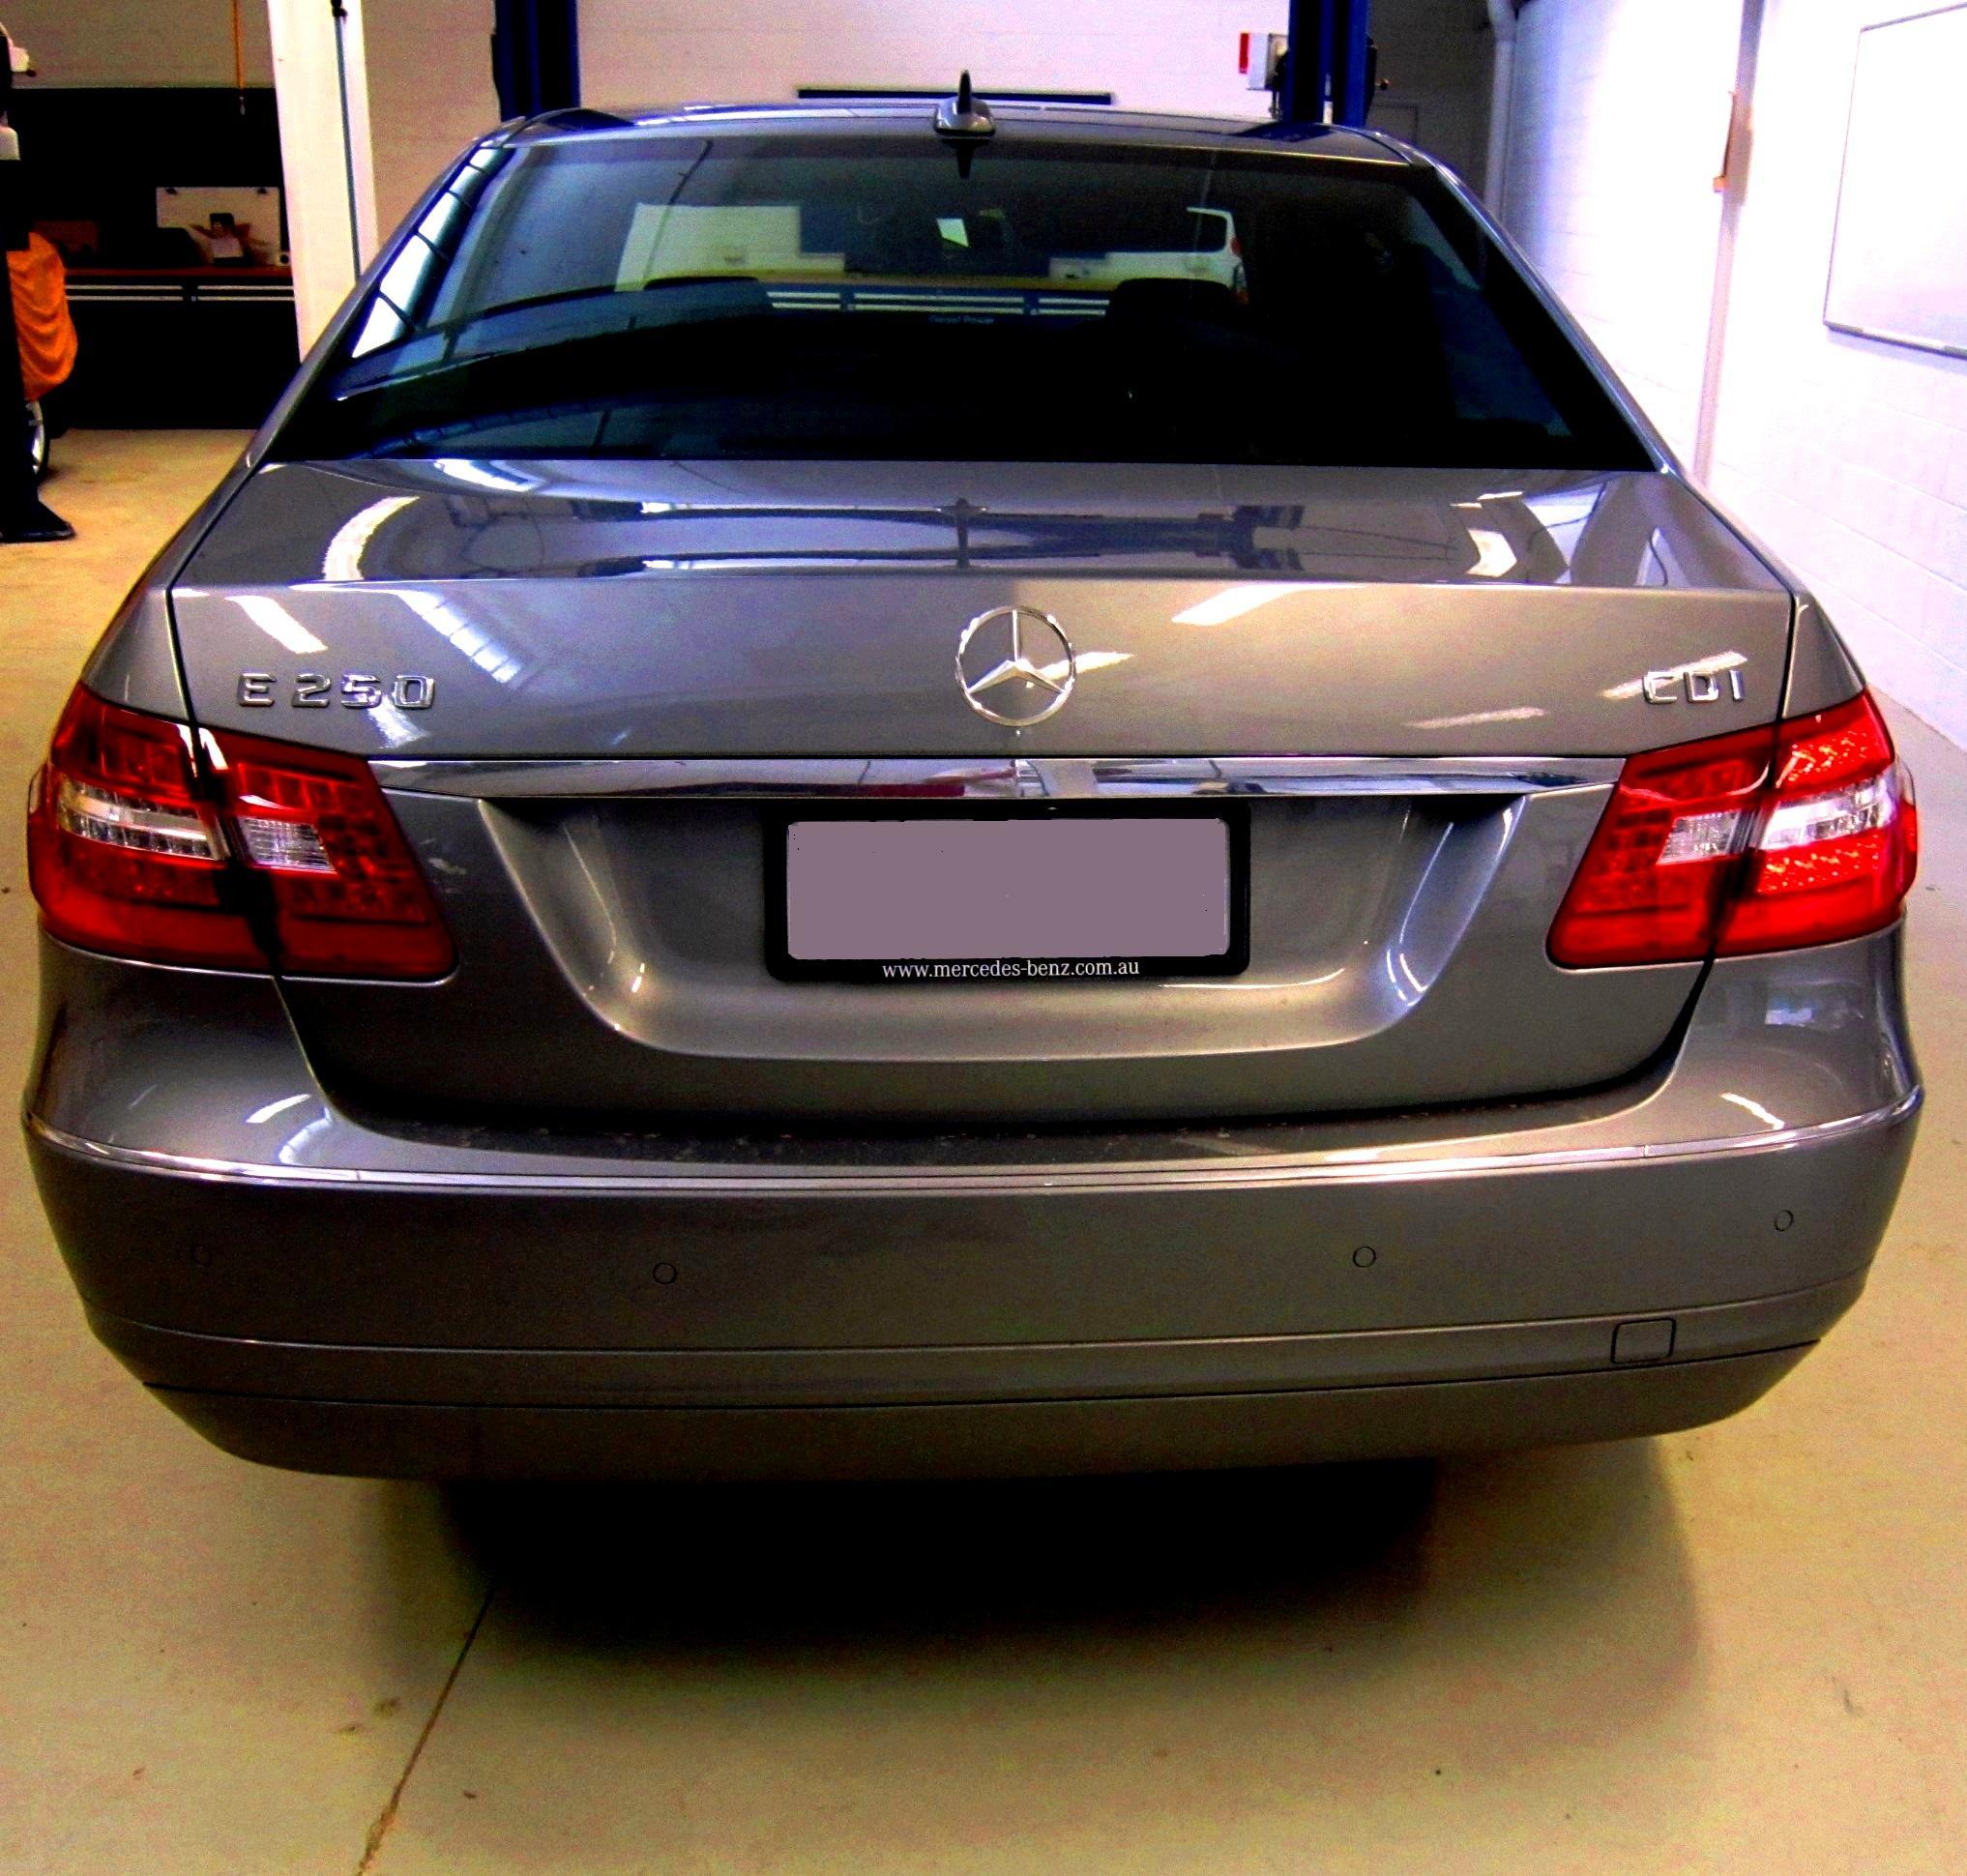 2011 Mercedes Benz E350 Bluetec: File:2010 Mercedes-Benz E 250 CDI (W 212) BlueEFFICIENCY